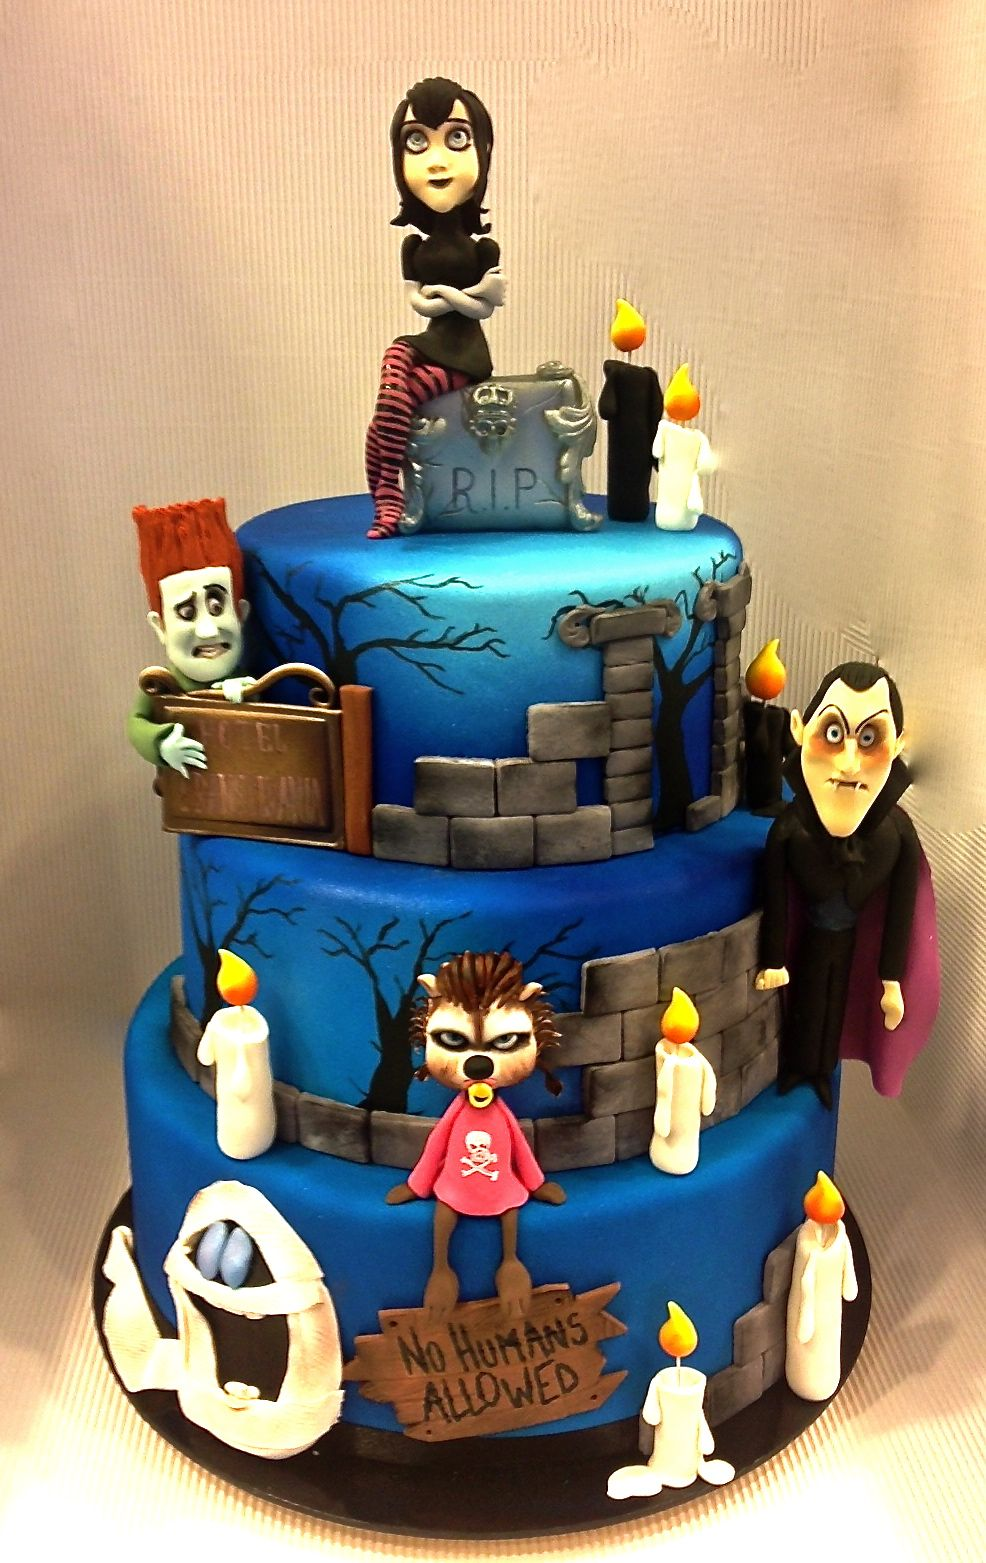 Hotel Transylvania Cake Designer Torte Festivit